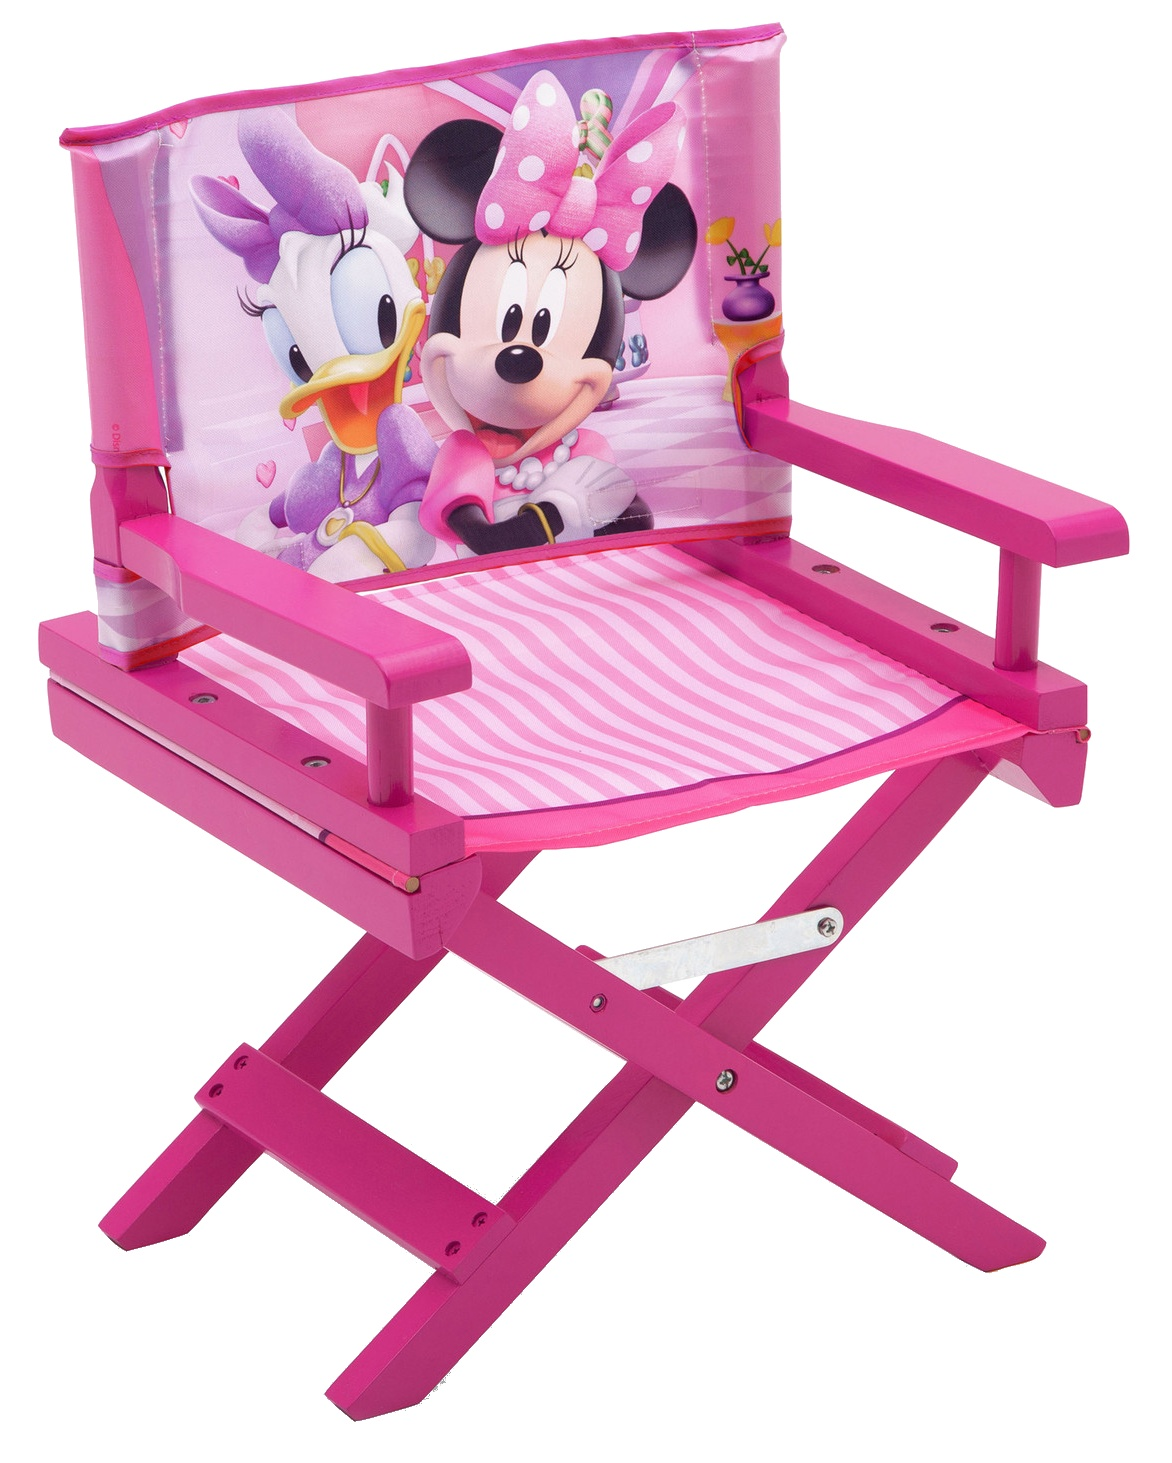 Incredible Disney Minnie Mouse Chair 36 X 53 X 29 Cm Pink Internet Toys Customarchery Wood Chair Design Ideas Customarcherynet